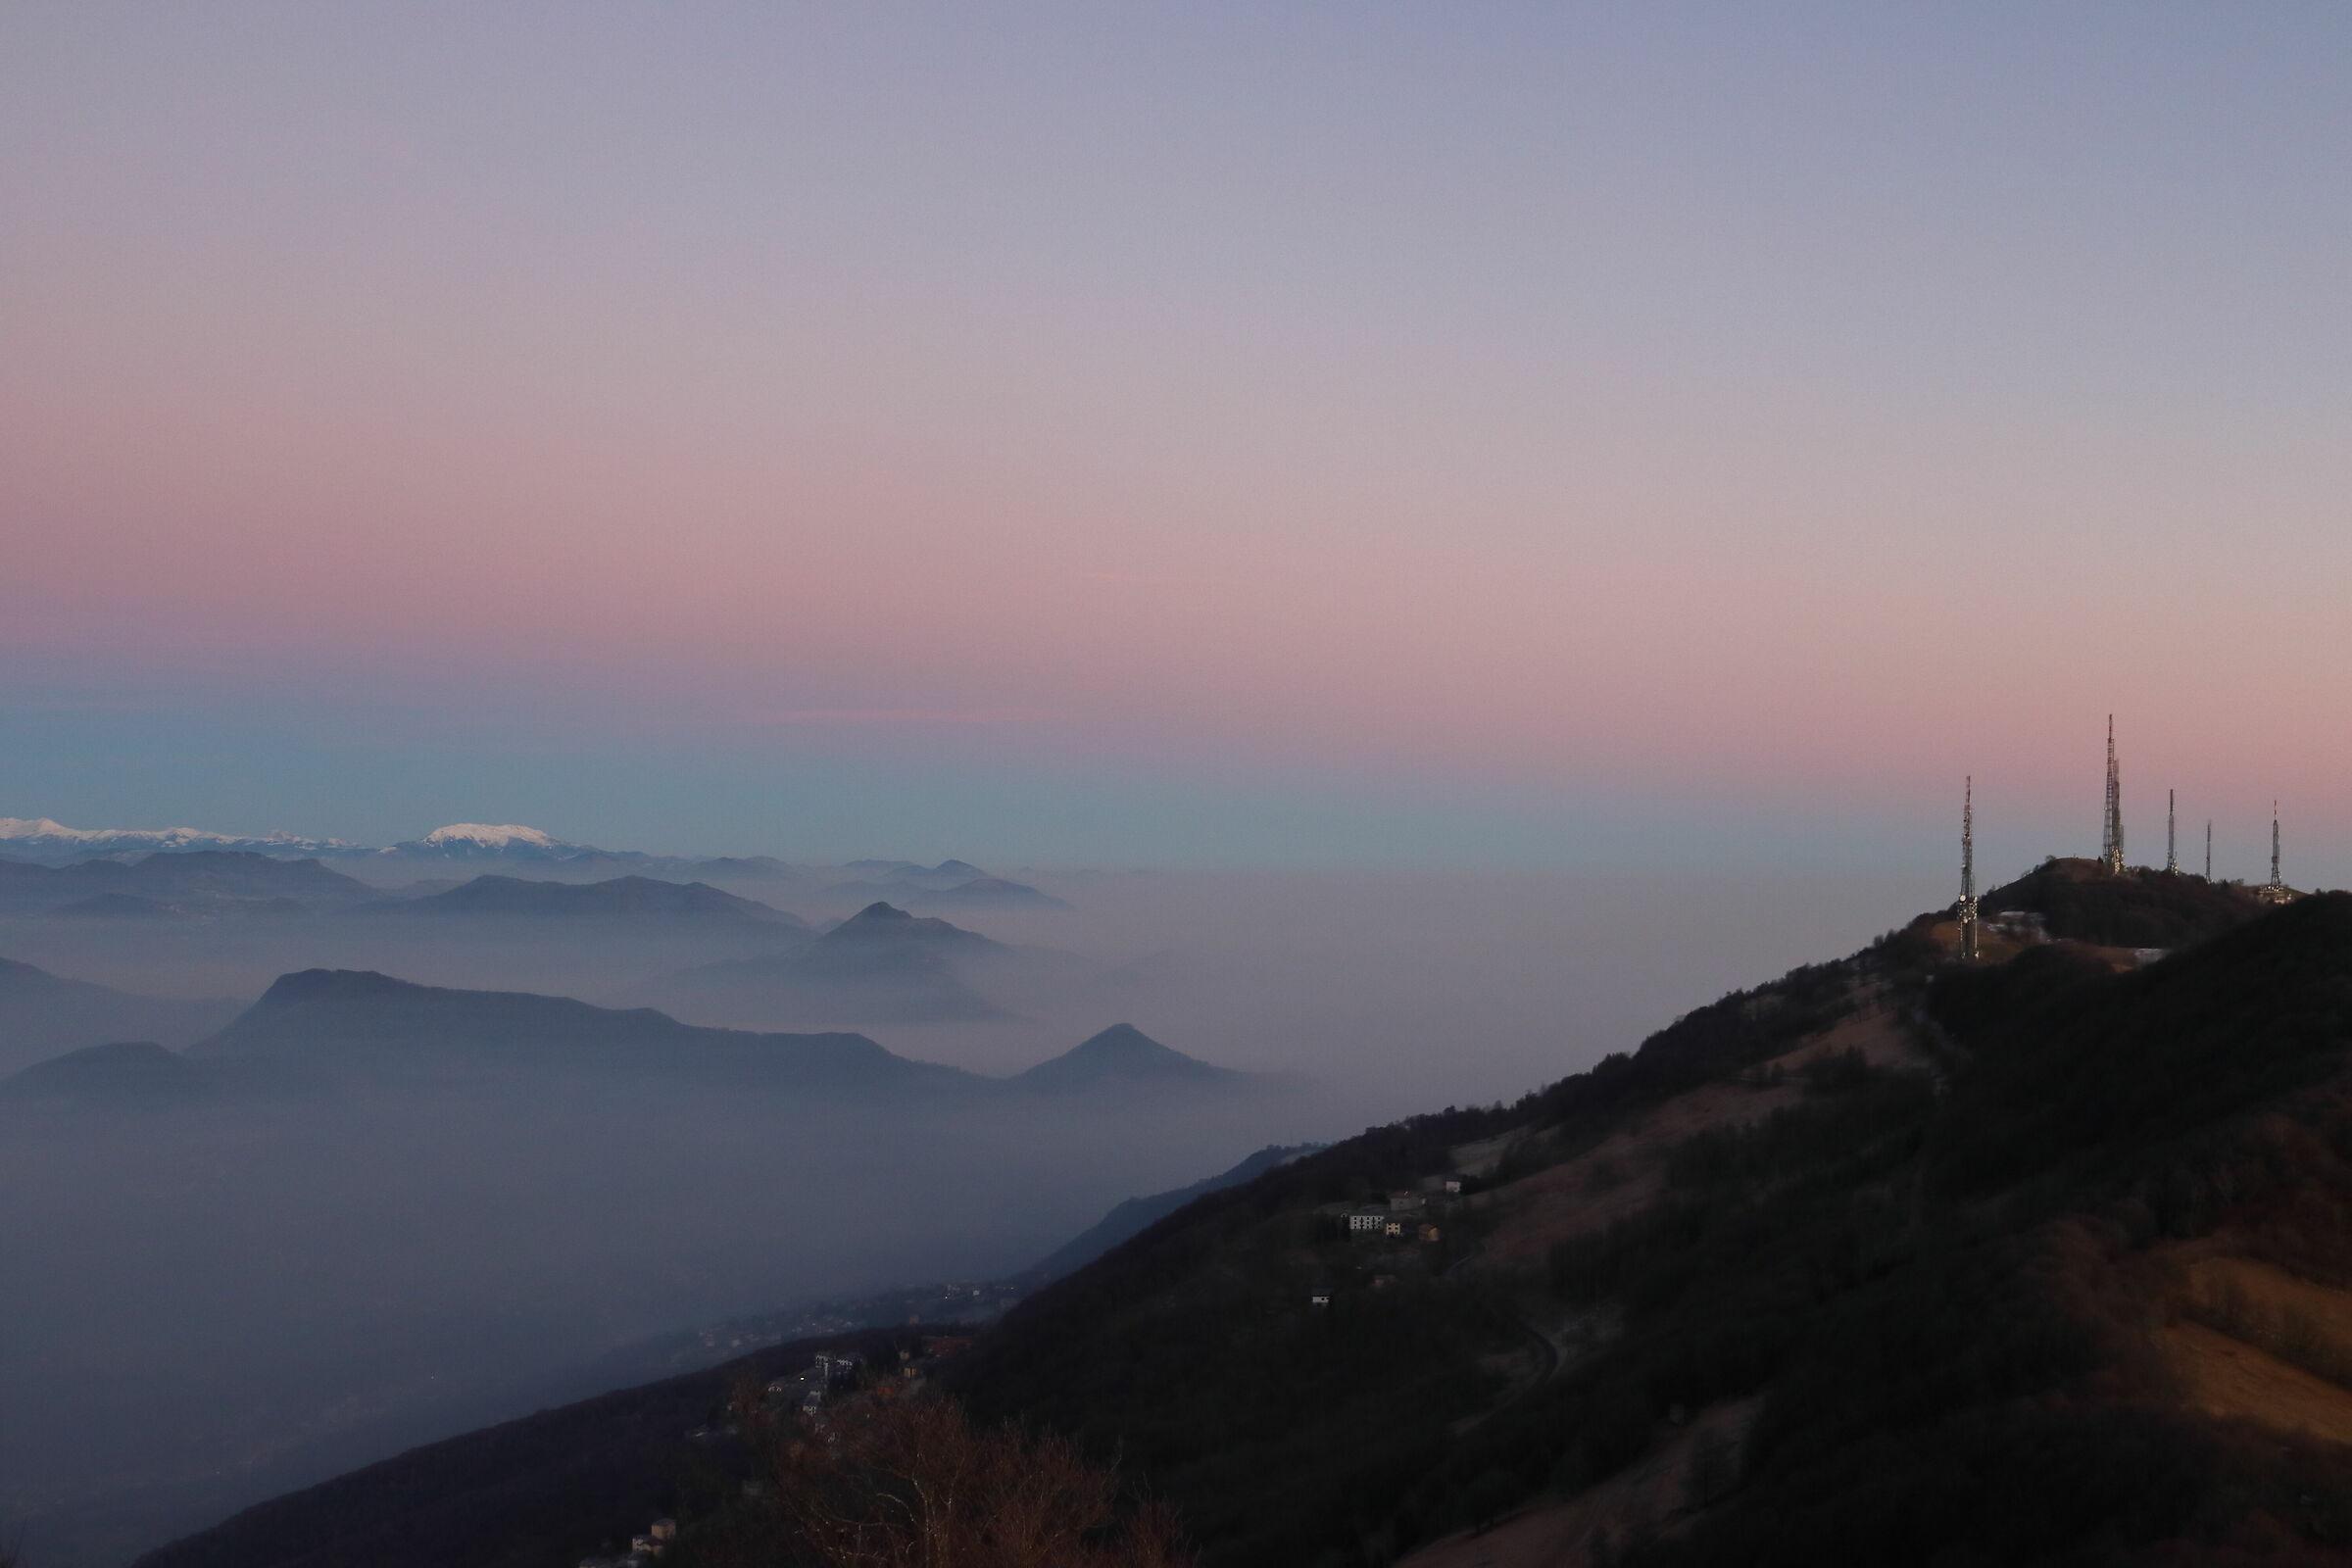 L'imbrunire in Valcava...